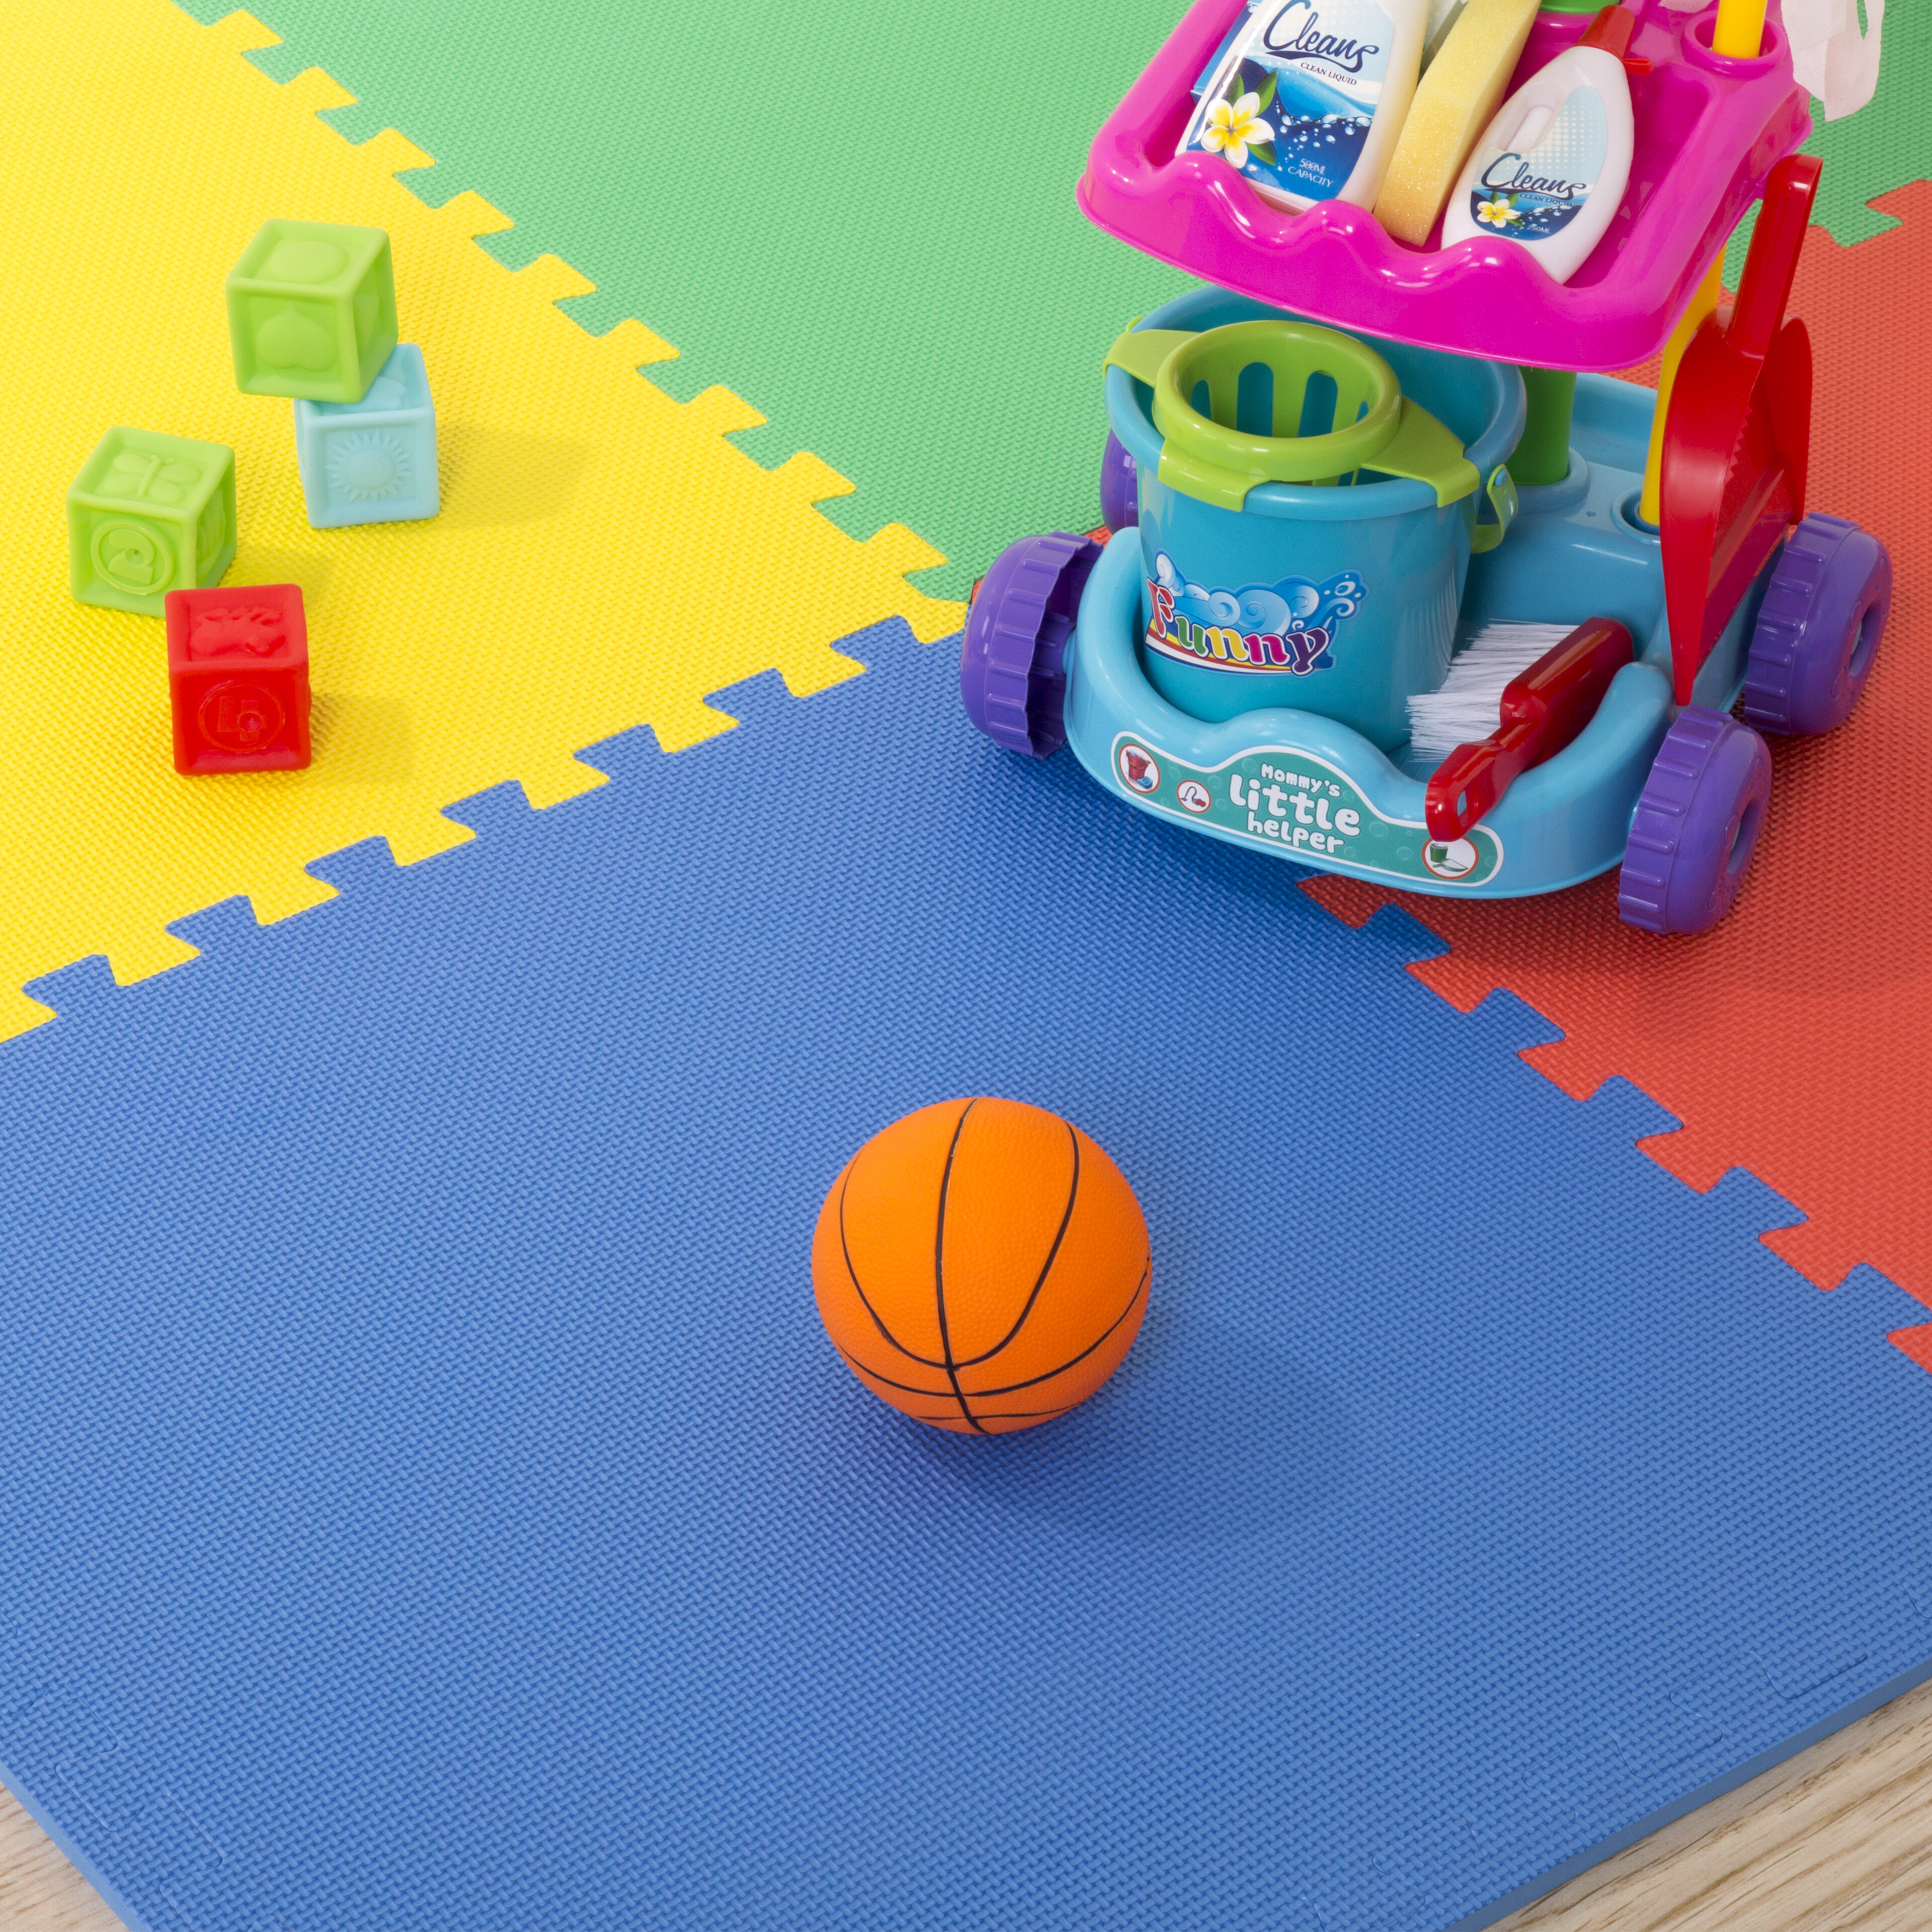 workout sports exercise feet homcom waterproof kid wood square floor mats interlocking outdoors soft play tiles grain foam mat